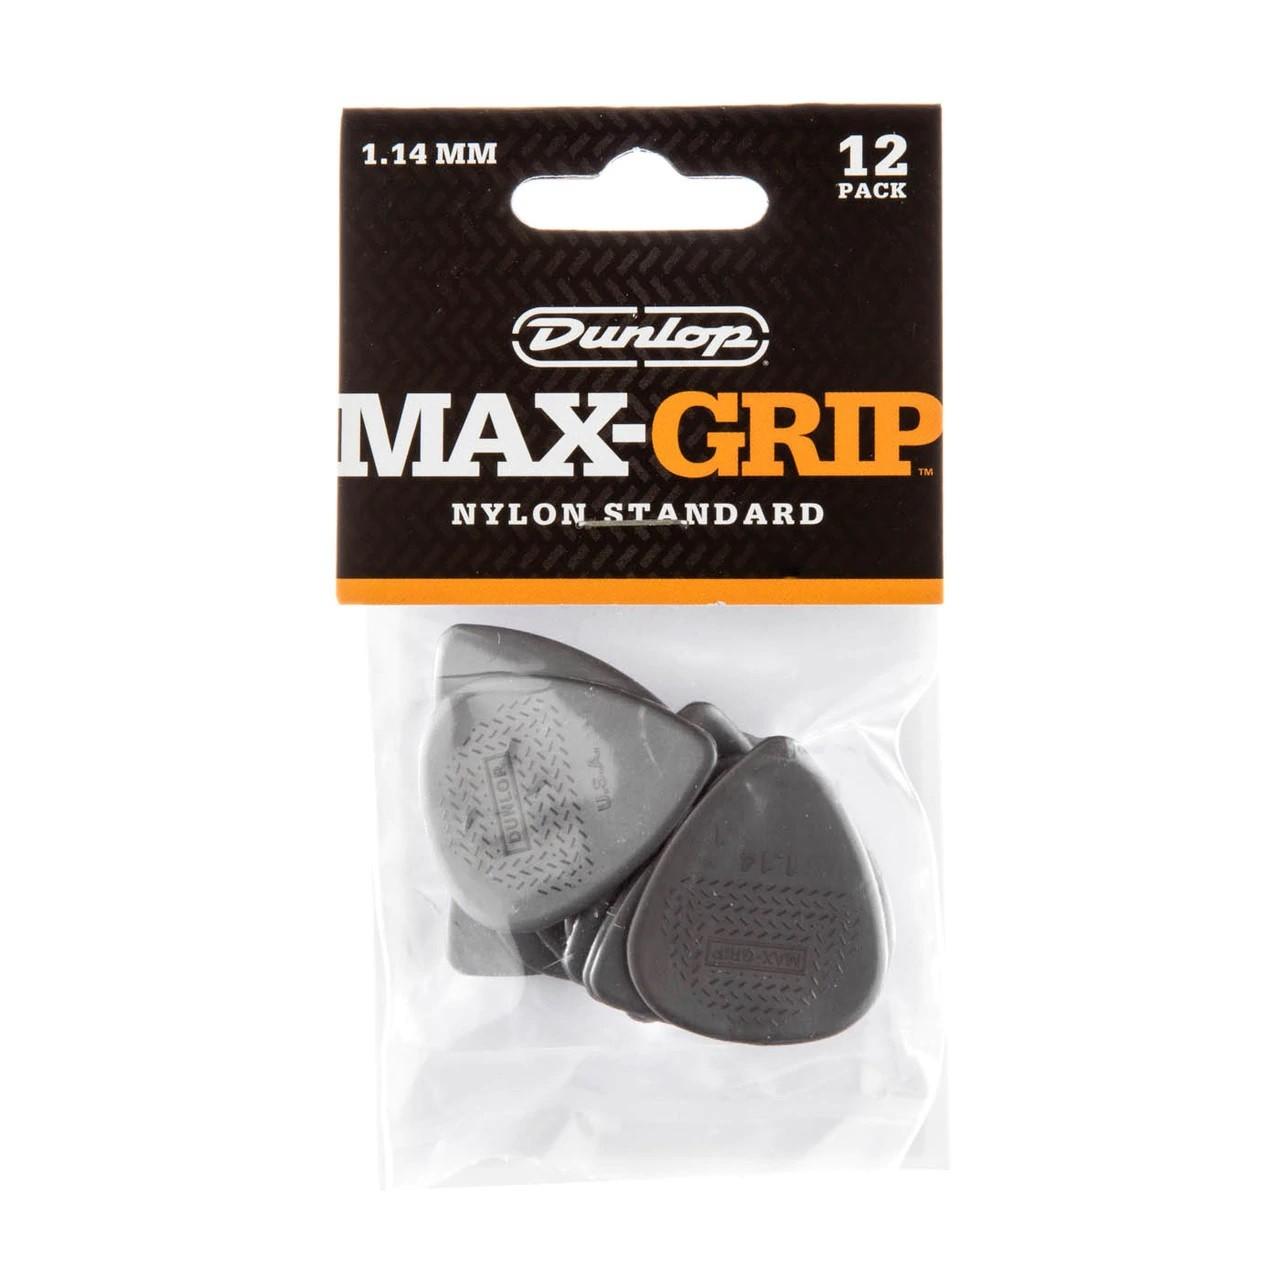 PALHETA MAX-GRIP NYLON 1.14MM CINZA C/12 449P - DUNLOP